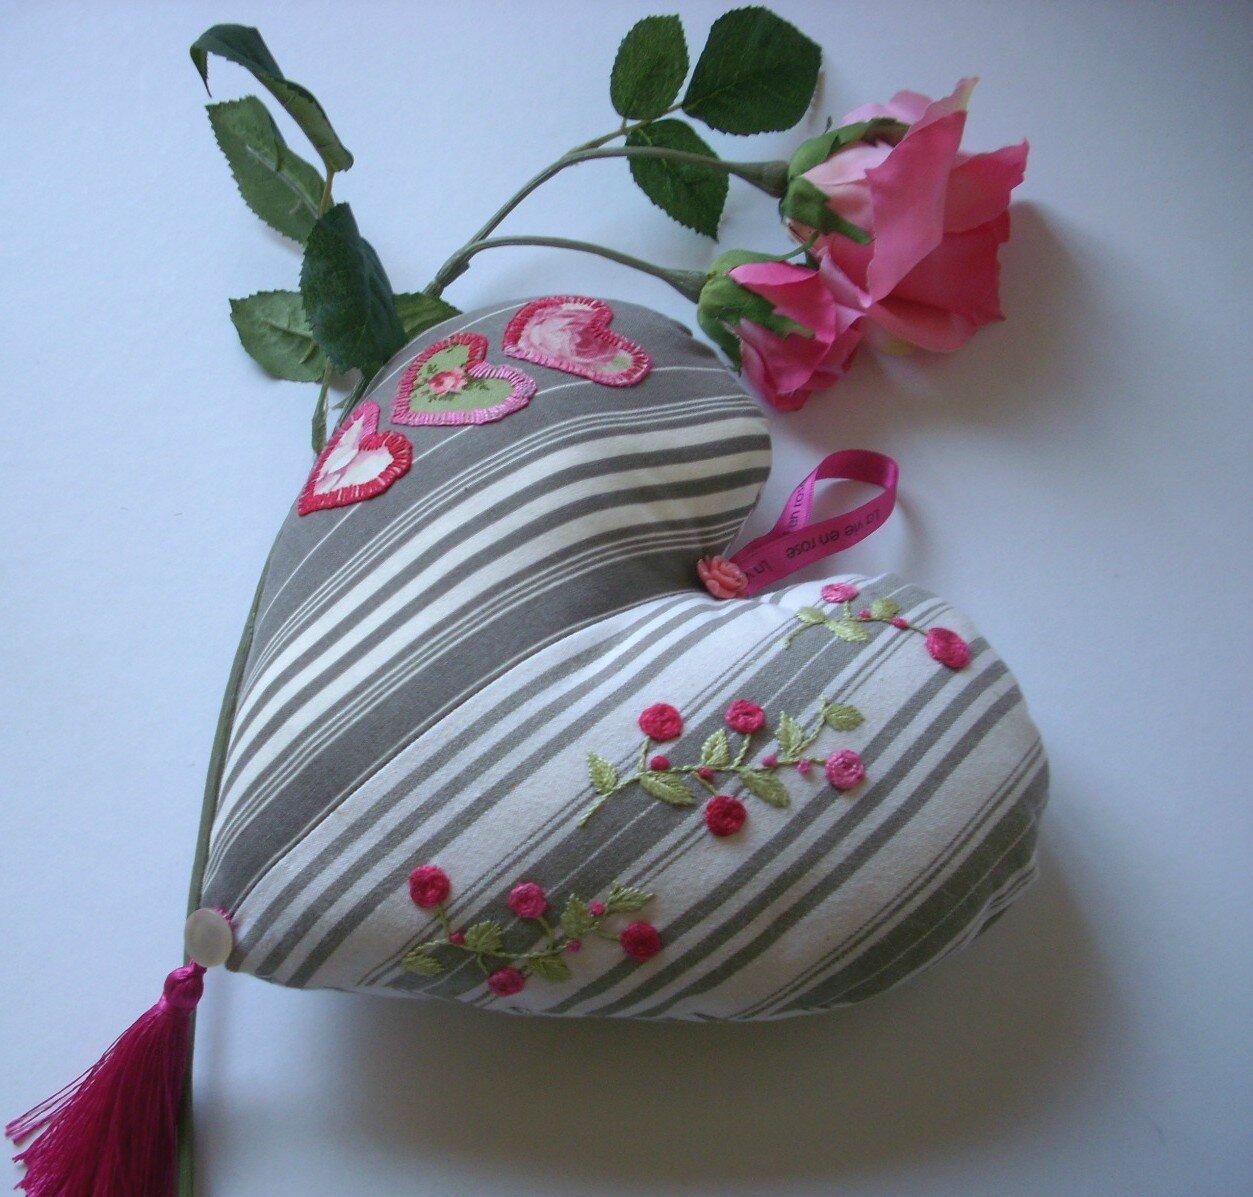 coeur aux roses